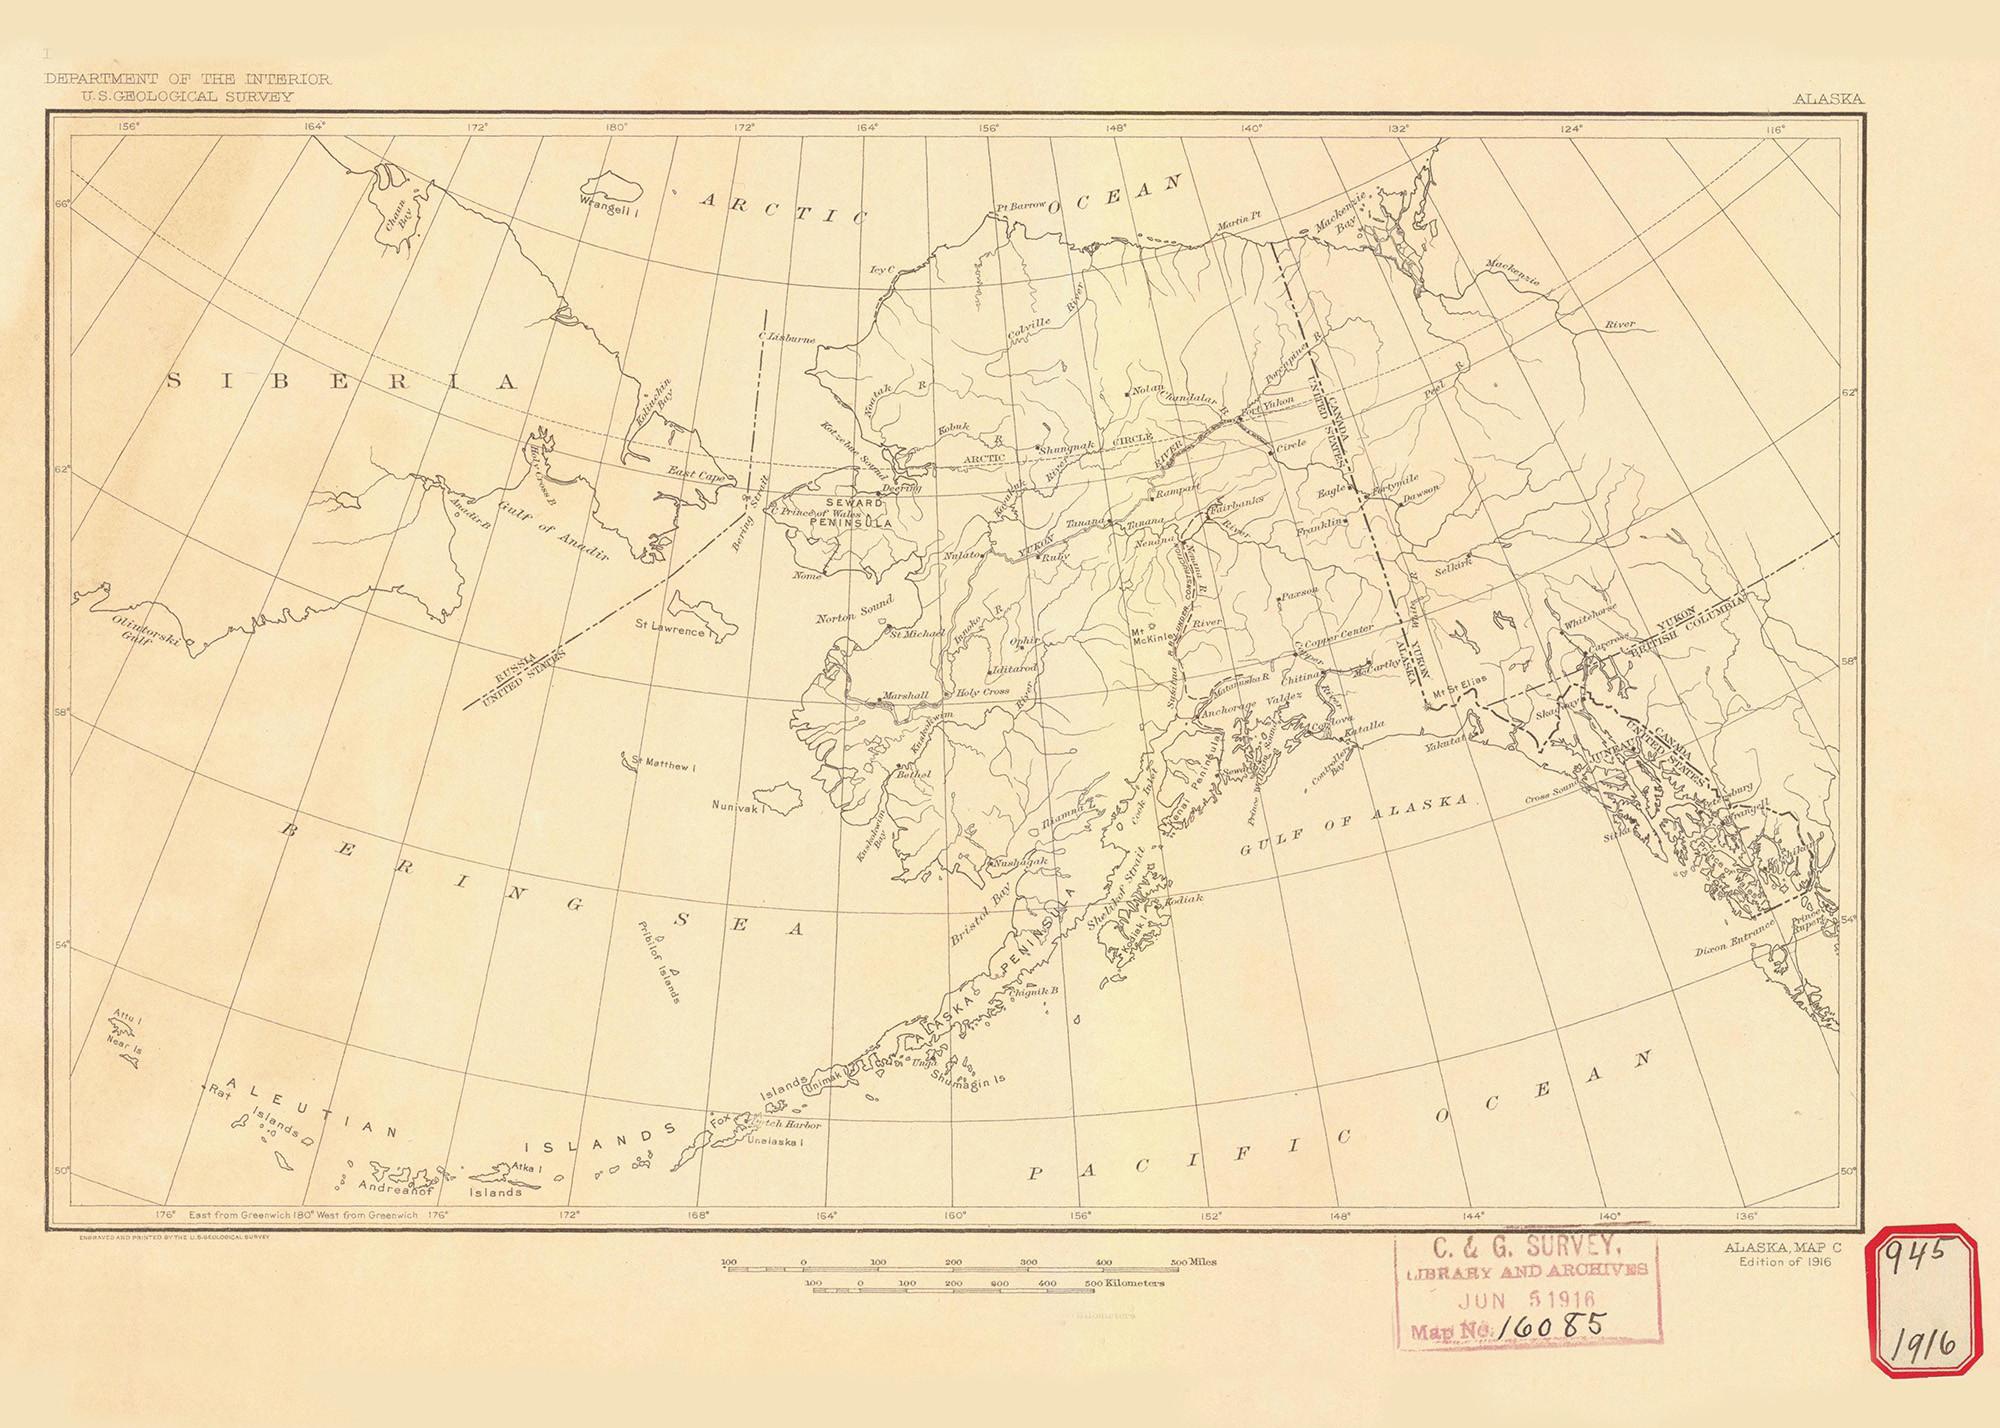 Historical Nautical Chart - 16085-00-1916 Alaska Map C on map of eklutna alaska, map of copper center alaska, map of yentna river alaska, map of port lions alaska, map of prospect creek alaska, map of gambell alaska, map of anvik alaska, map of tazlina alaska, full map of alaska, map of iliamna alaska, map of caswell alaska, map of new stuyahok alaska, map of arctic village alaska, map of the state of alaska, map of savoonga alaska, map of campbell creek alaska, map of hooper bay alaska, map of russian river alaska, map of chignik alaska, map of noorvik alaska,